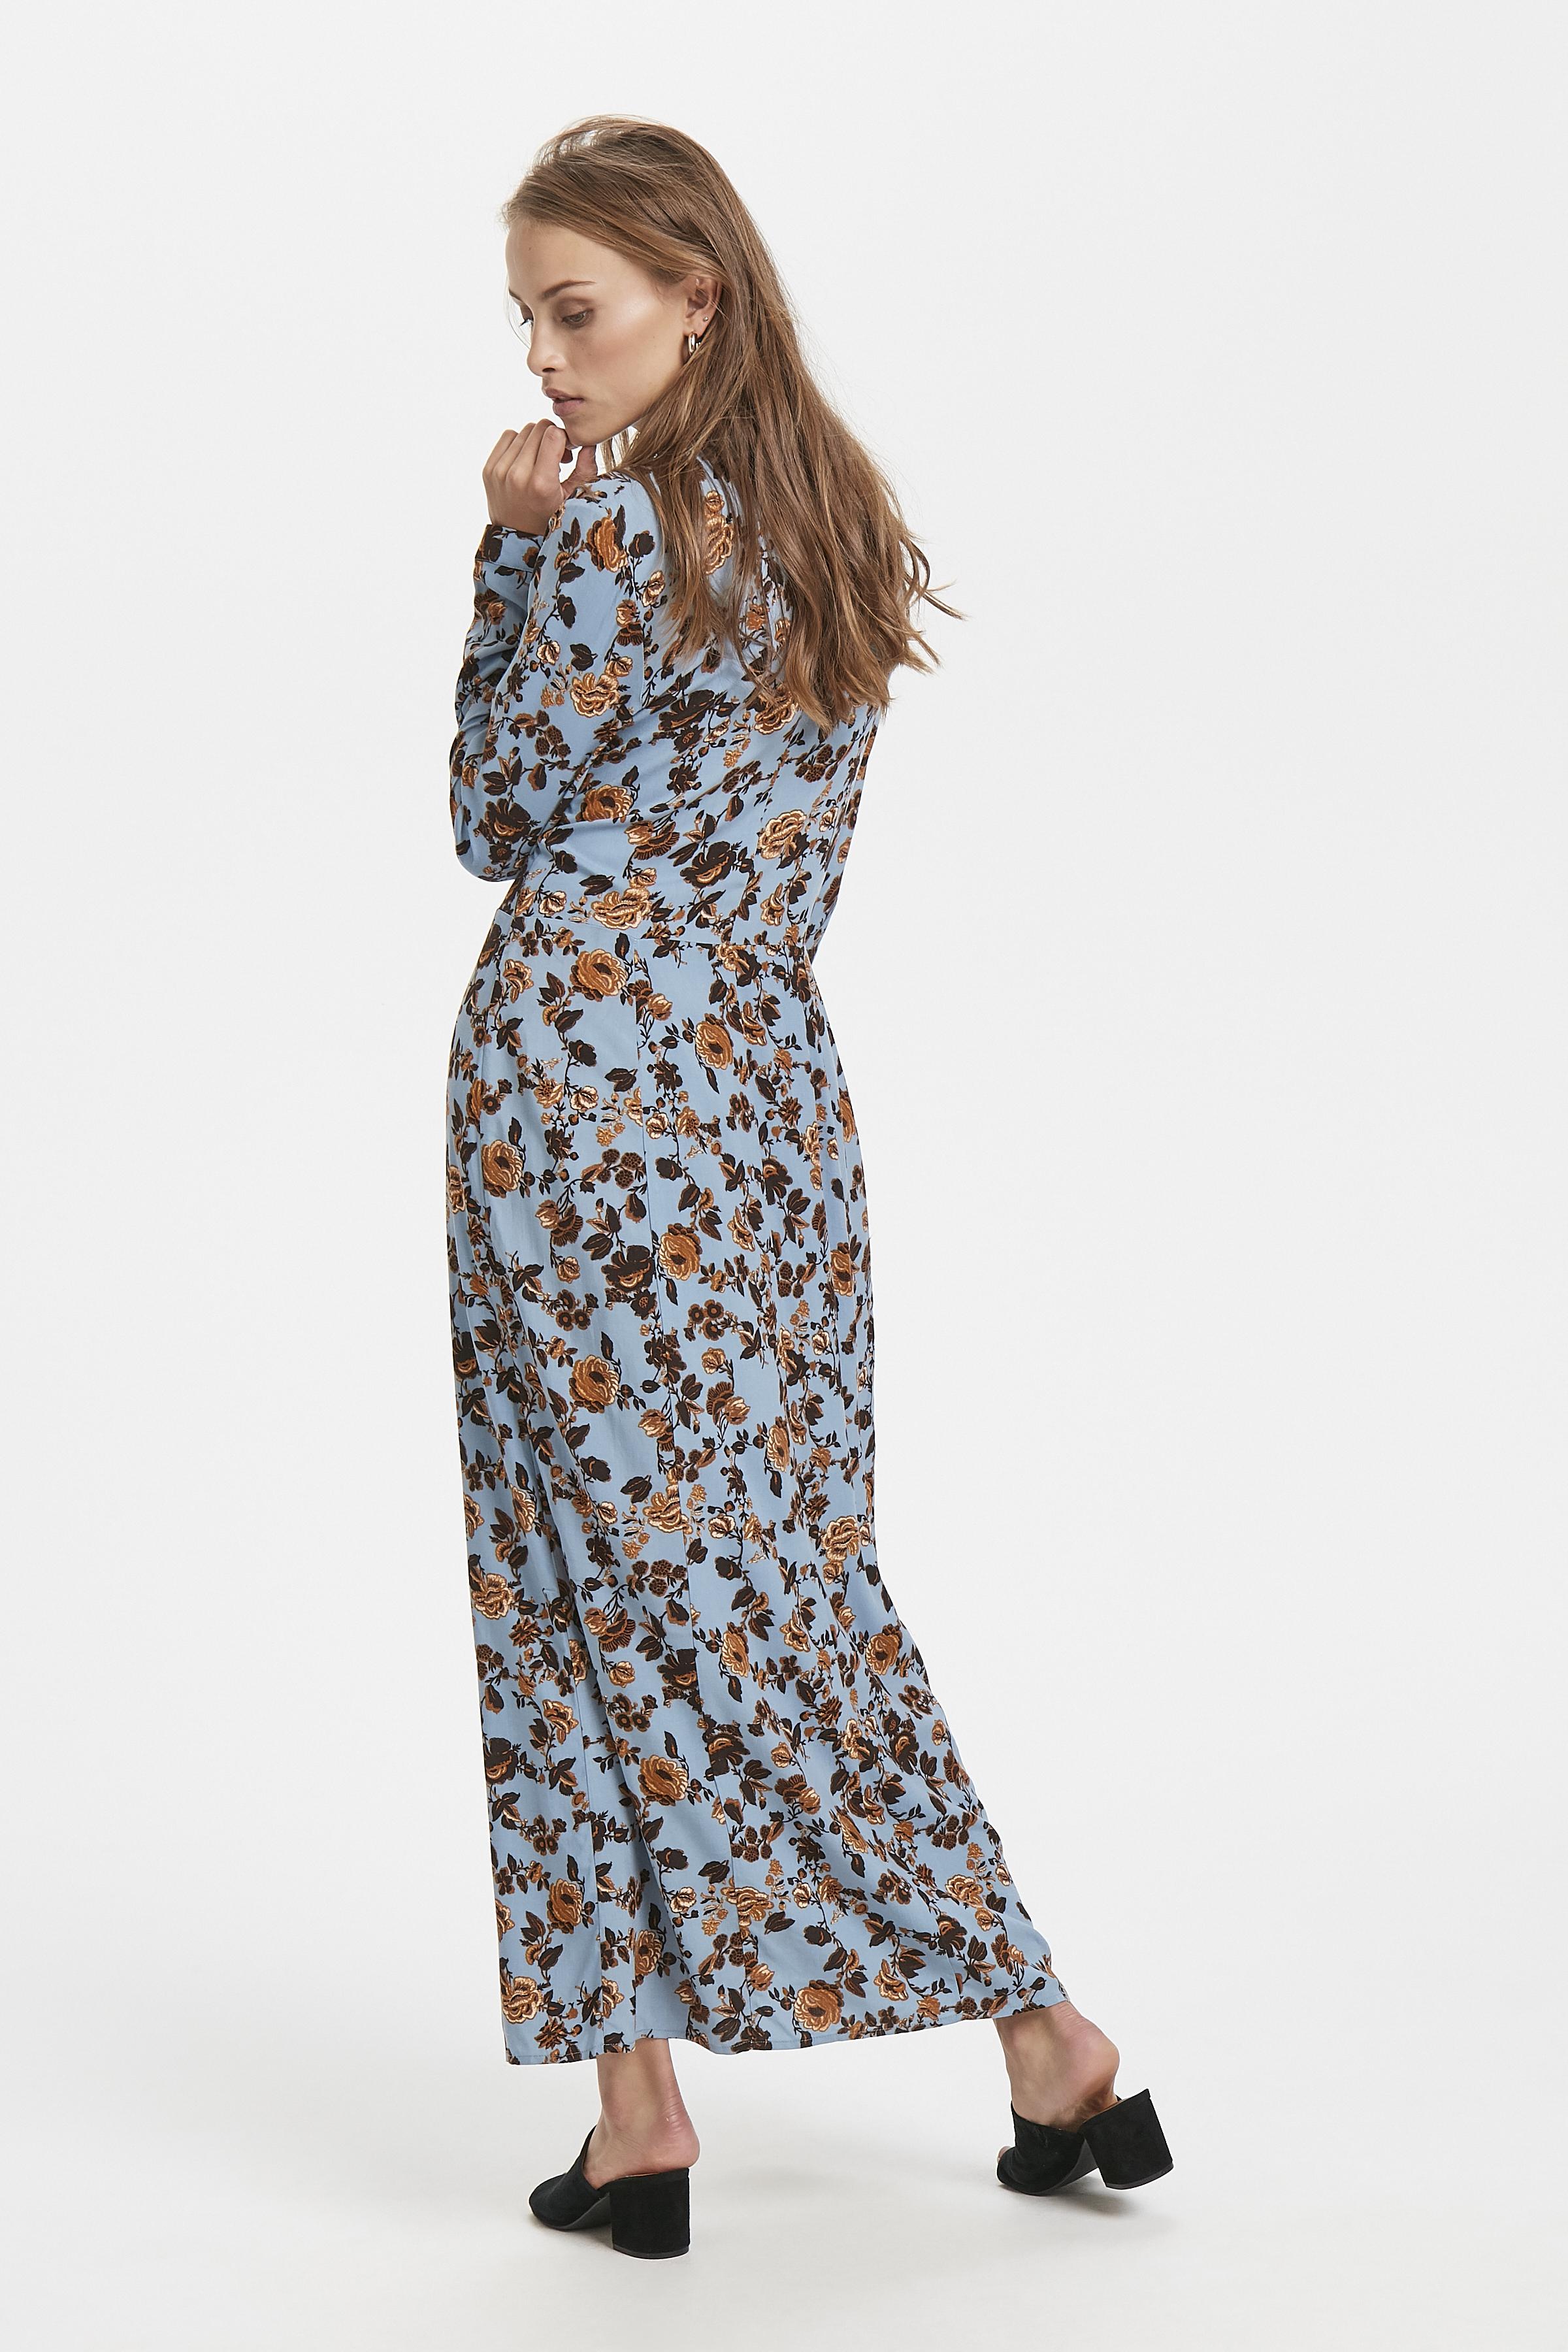 Blue Shadow Kjole – Køb Blue Shadow Kjole fra str. 34-42 her